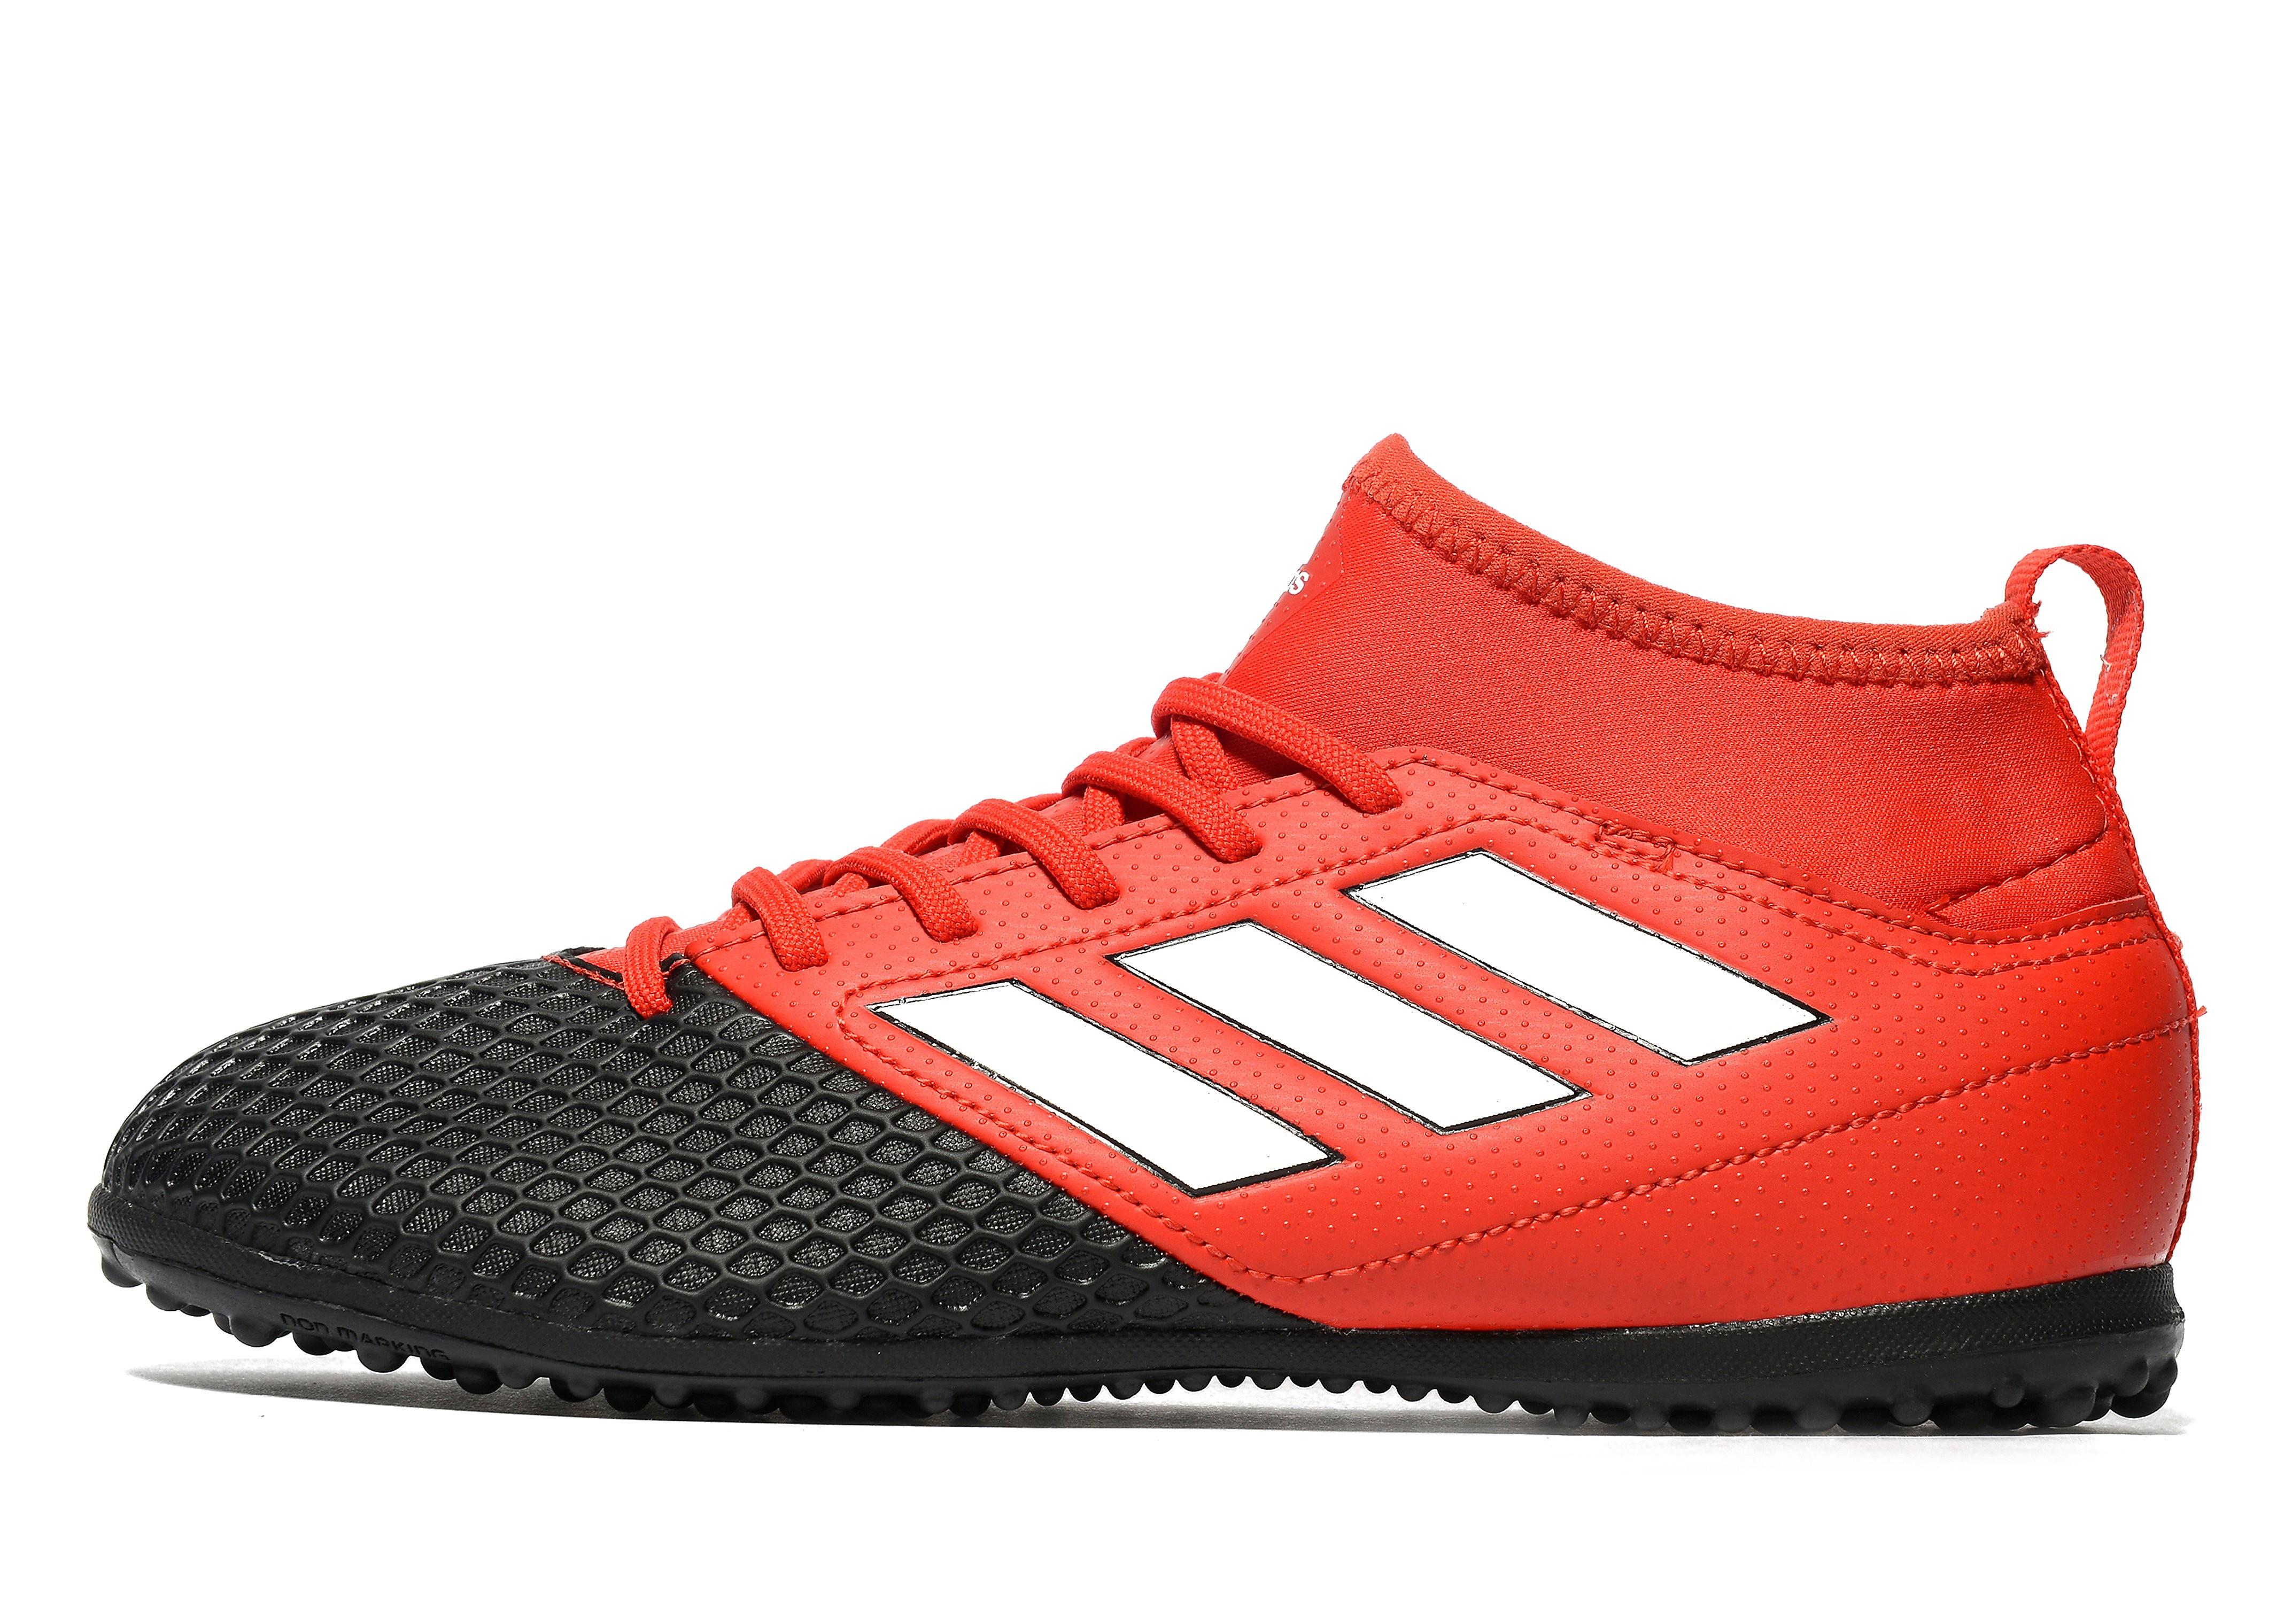 adidas Red Limit ACE 17.3 Primemesh Turf Junior